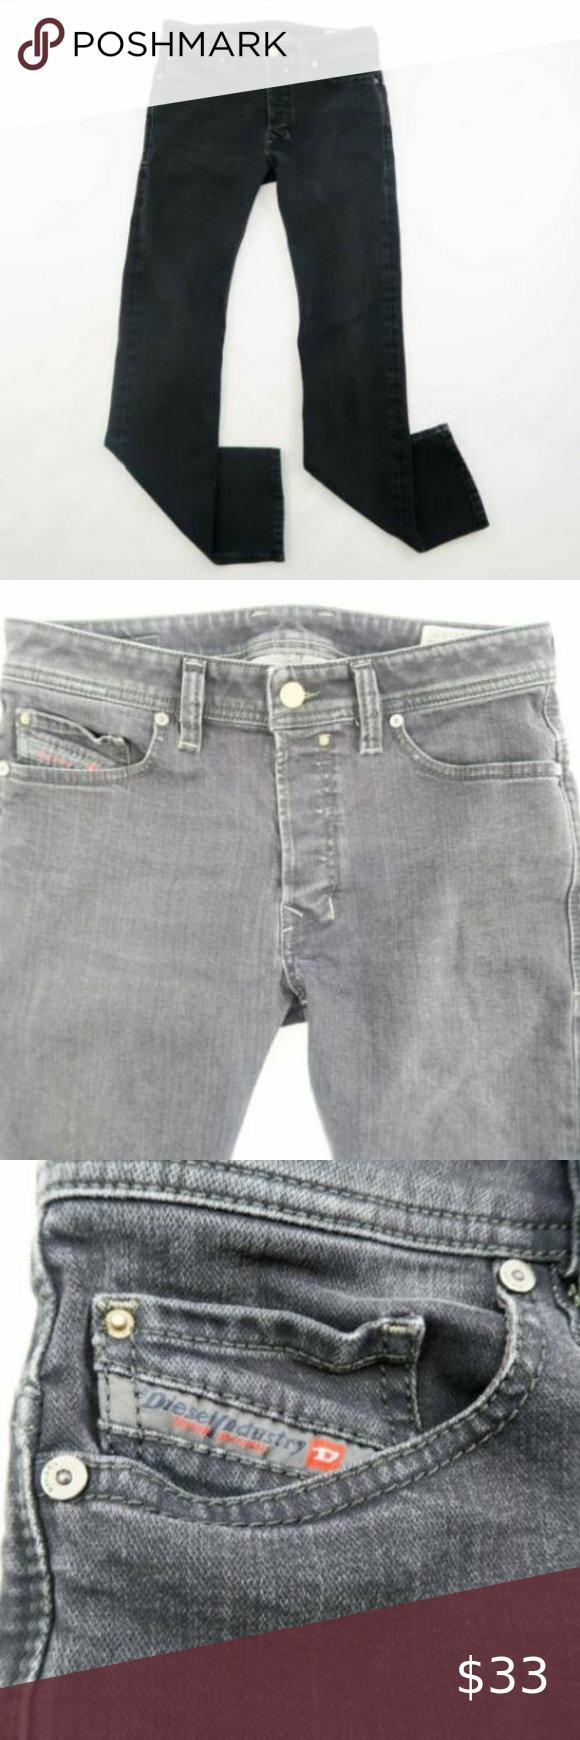 DIESEL Safado 0842K Regular Straight Regular Denim DIESEL Safado 0842K Regular Straight Regular Denim Jeans 27x30 Black Cotton Diesel Jeans Straight